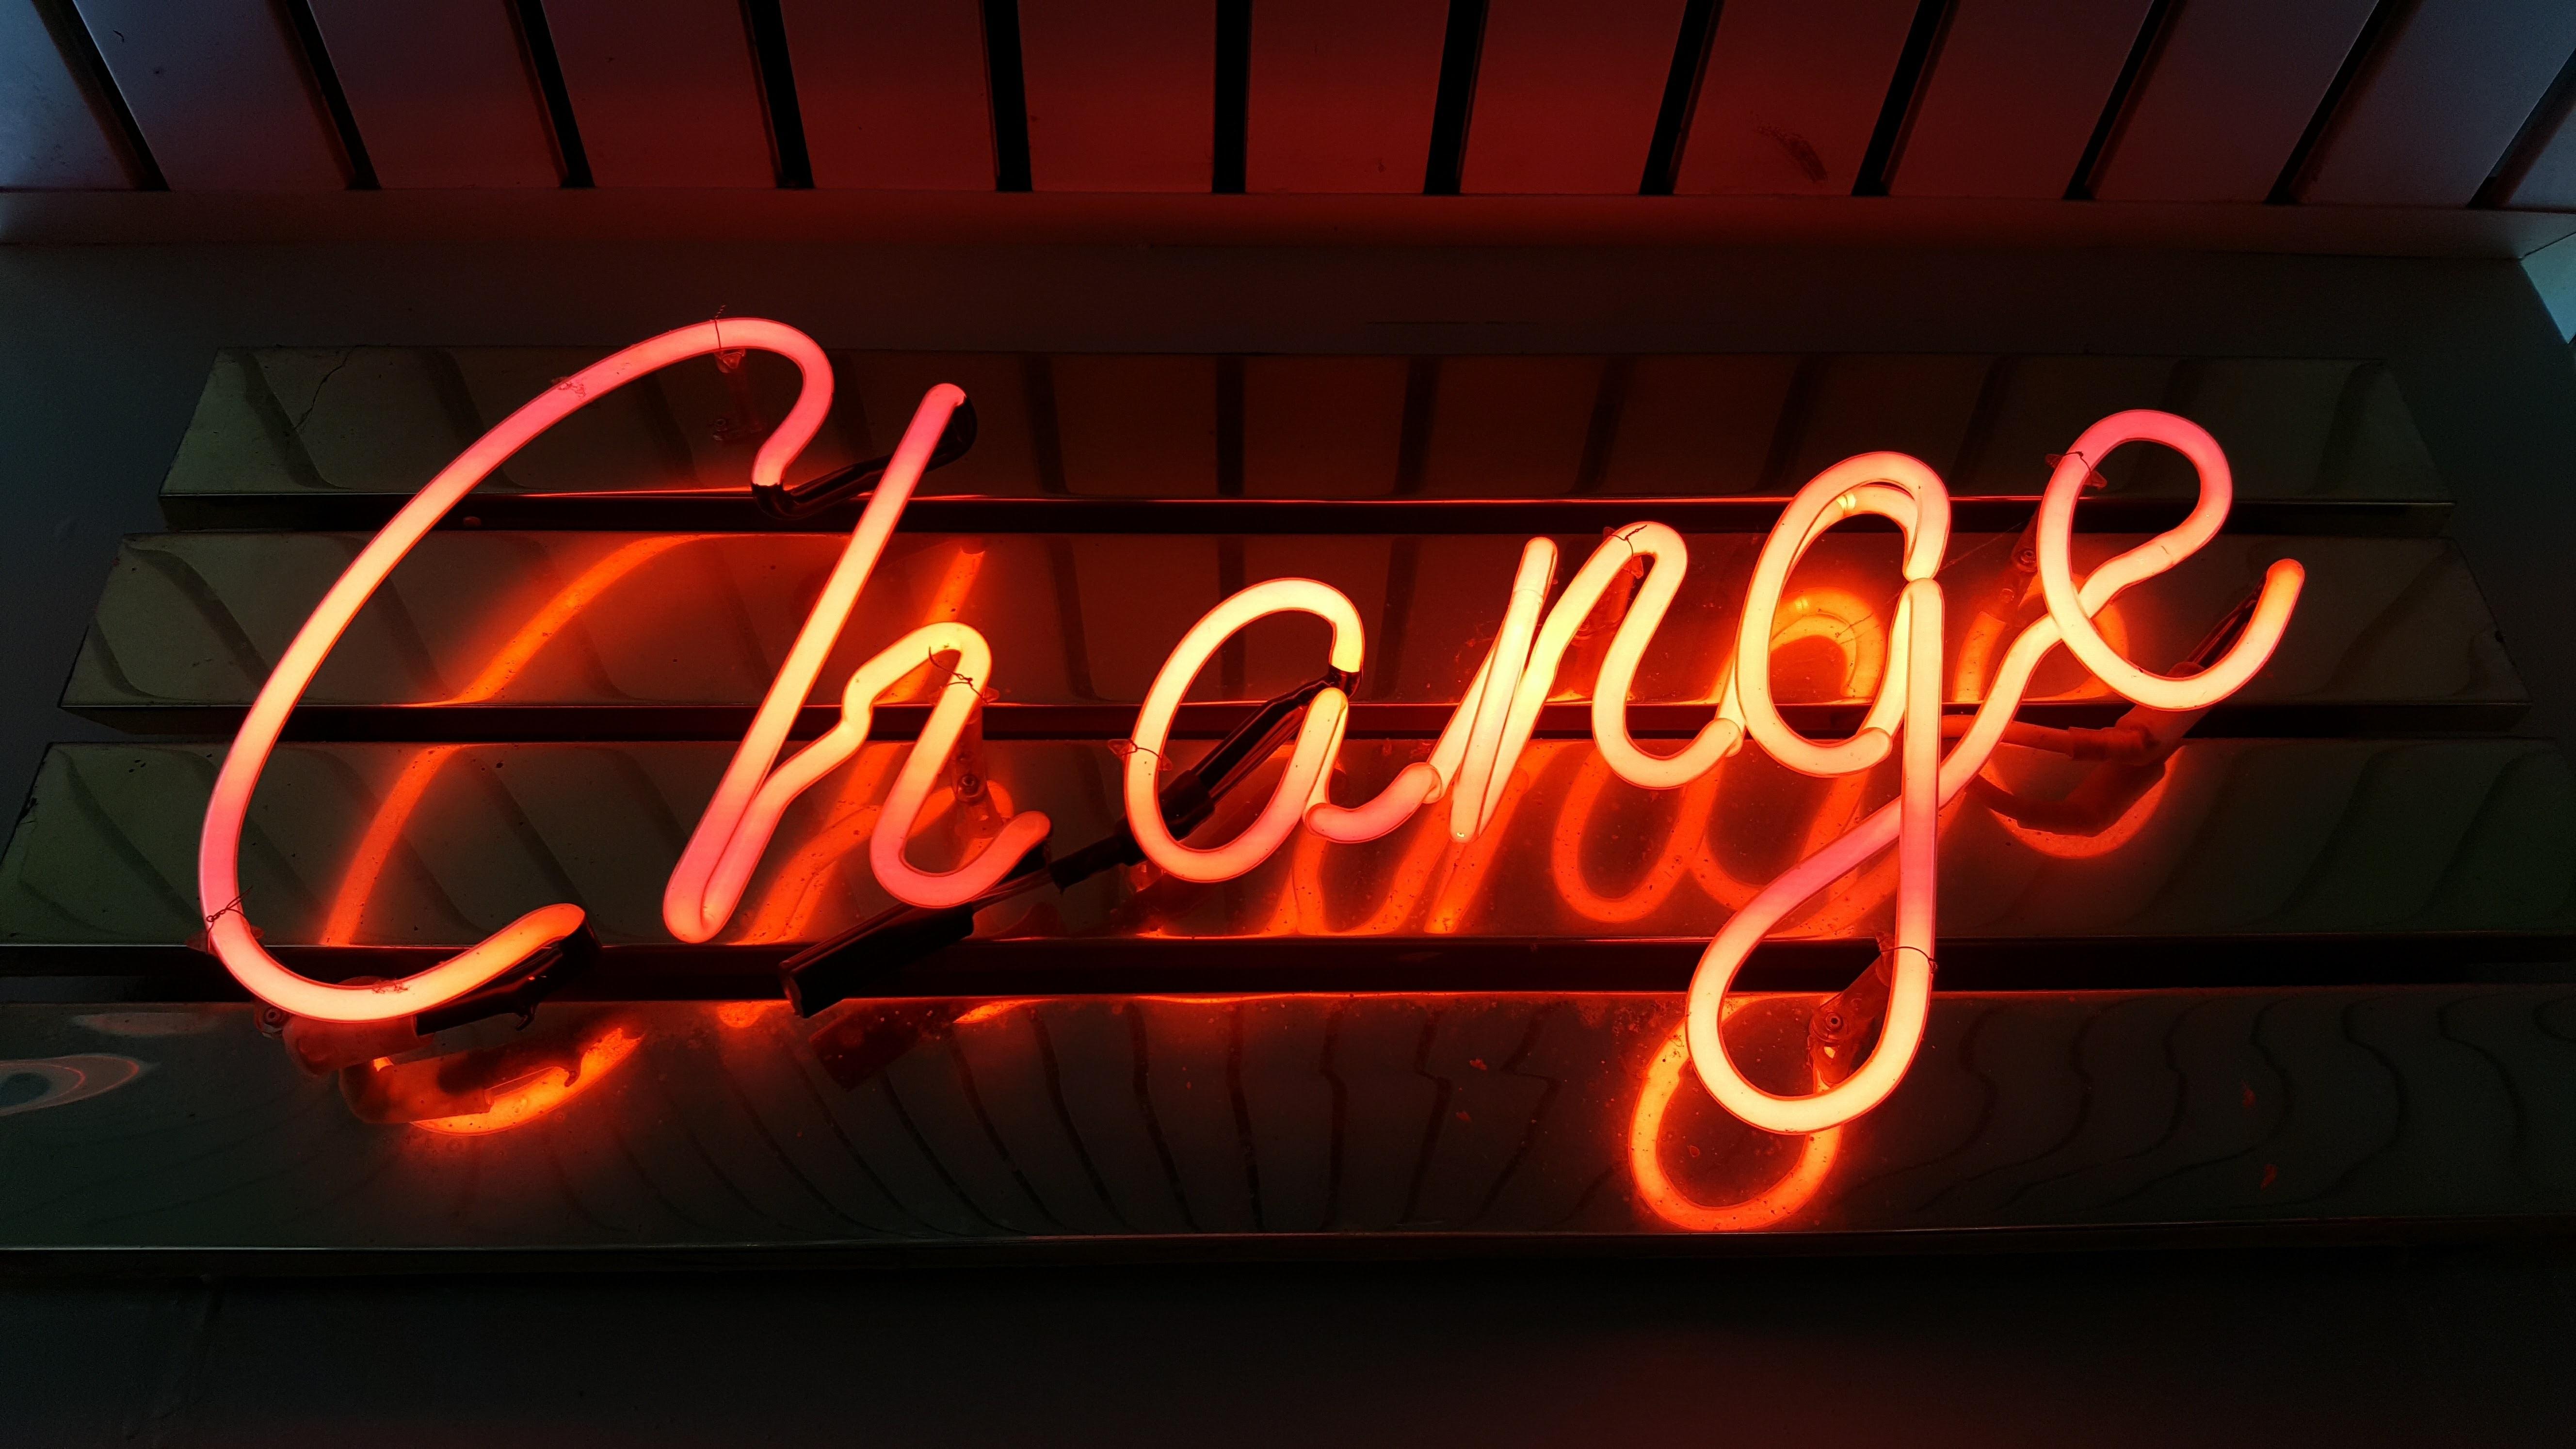 Transformational Coaching: Helping Change Your Life Now